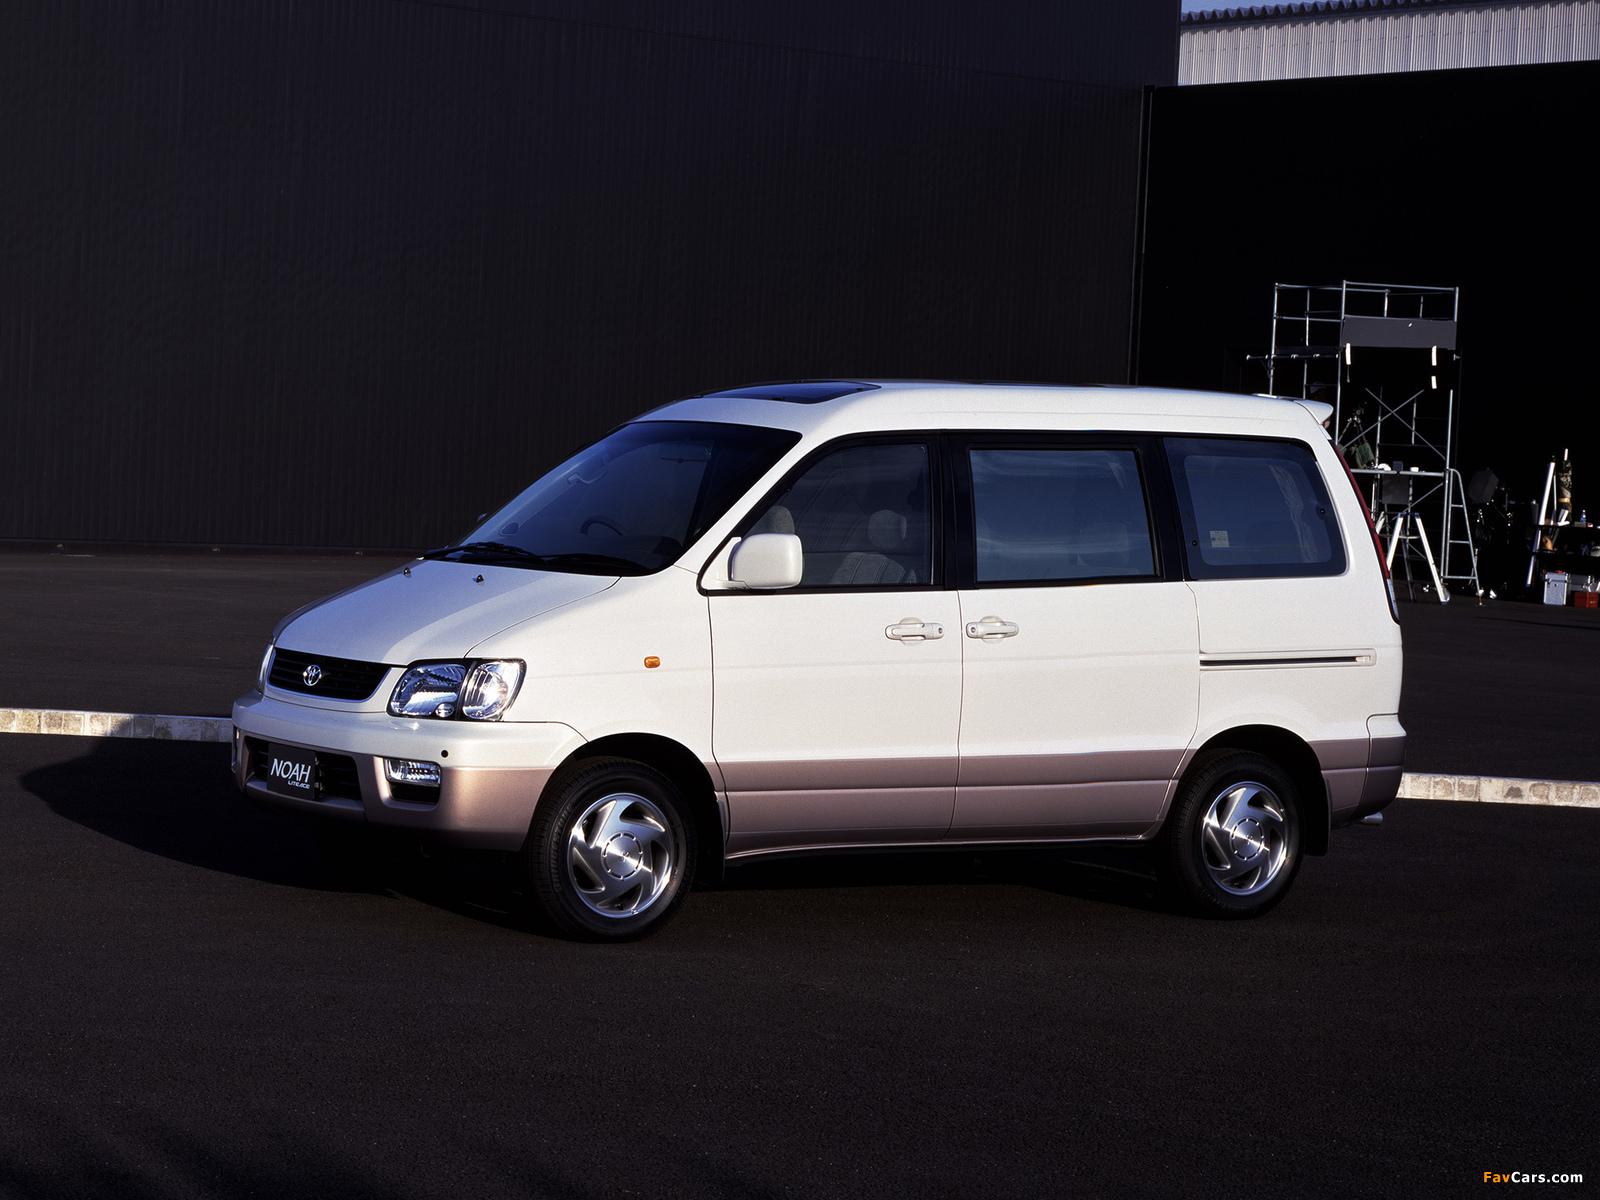 Toyota LiteAce Noah 2WD (R40G) 1996 photos (1600 x 1200)